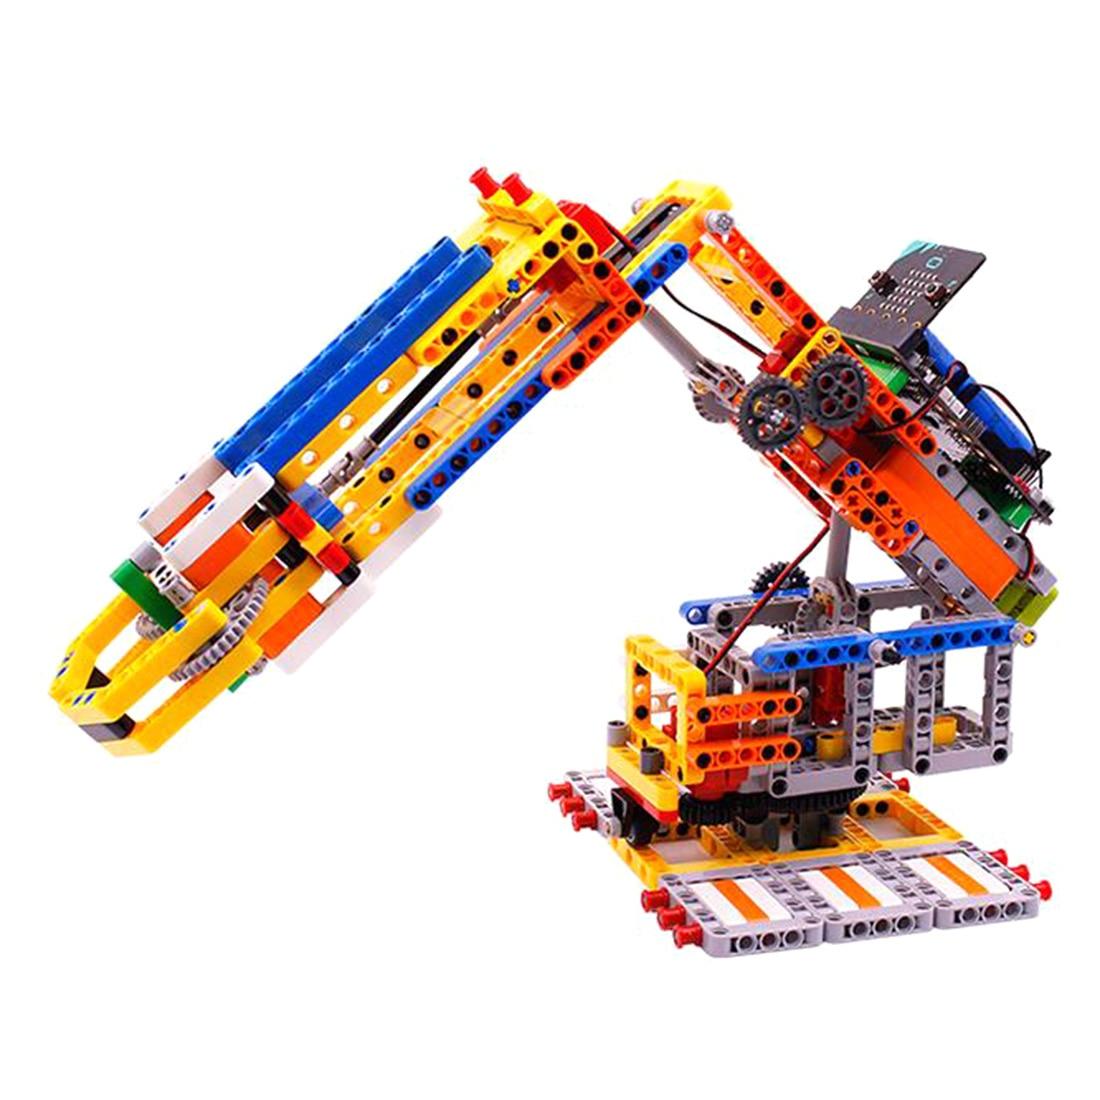 MODIKER 2019 New for Micro:bit Programmable Building Block DIY Smart Robotic Arm Kit High Tech Toys Gift